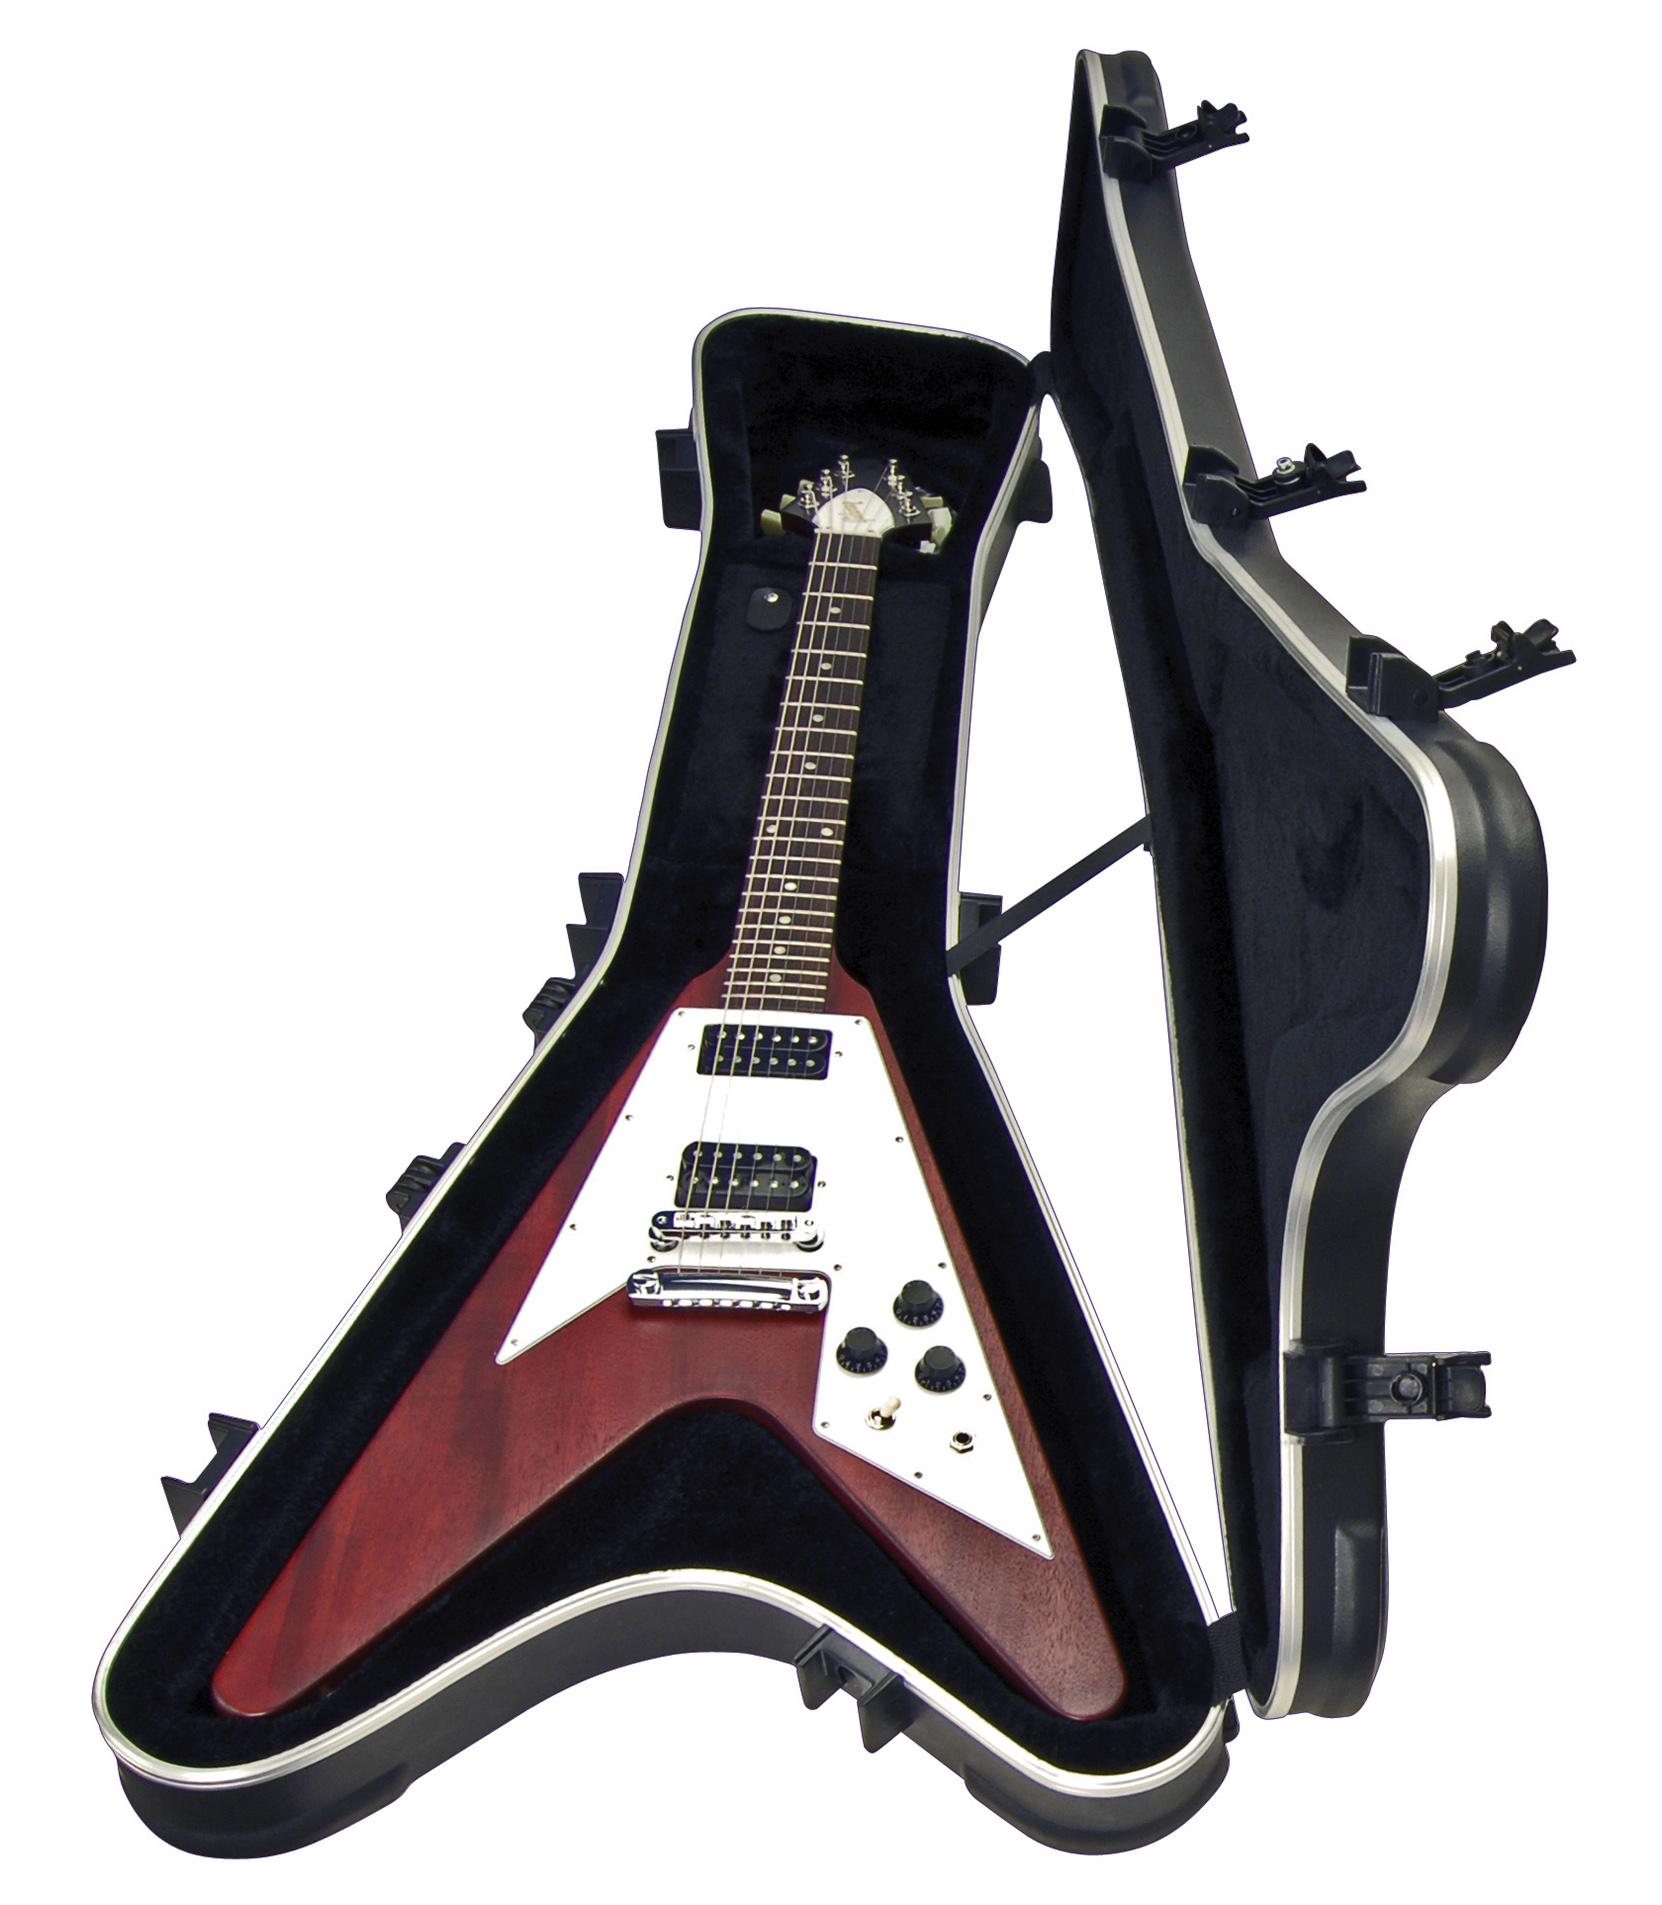 Melody House Musical Instruments Store - 1SKB 58 Flying V Type HardshellTSA Latch Over